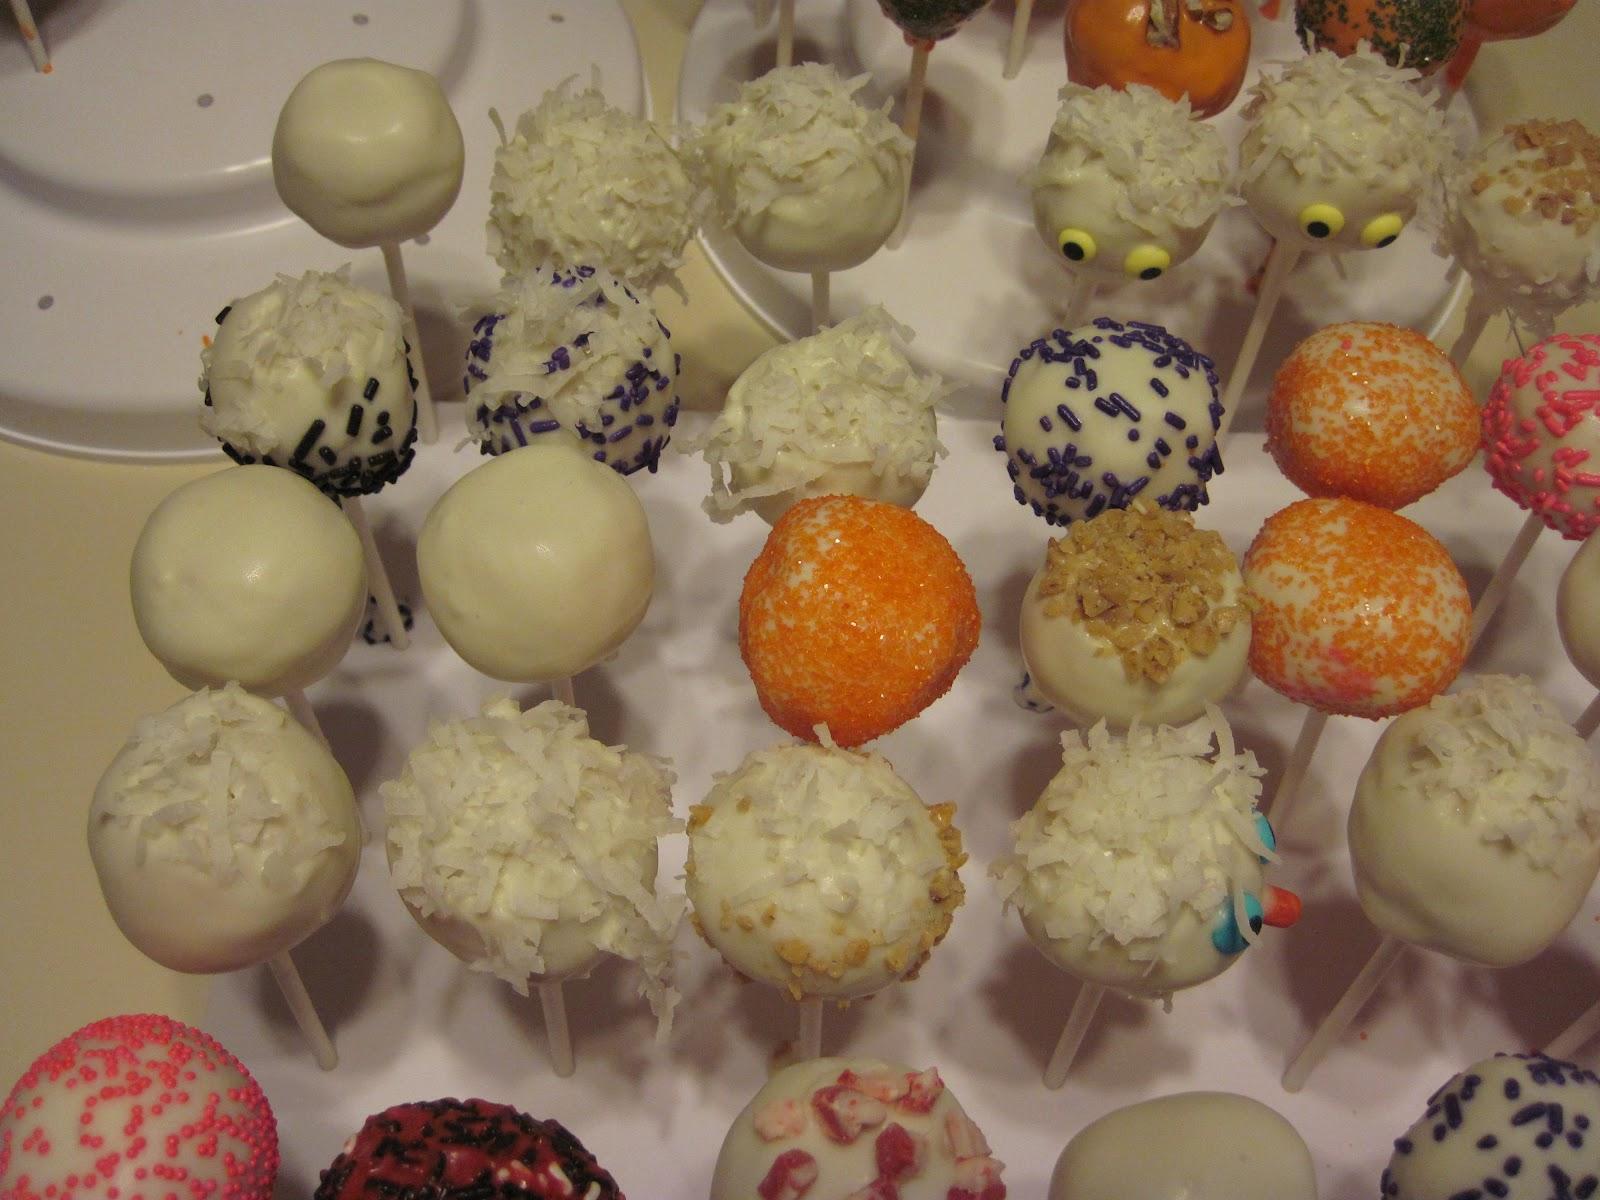 ... Cake Pops! Cowboy Creations!: Vanilla and Coconut Cream Cake Pops - 70